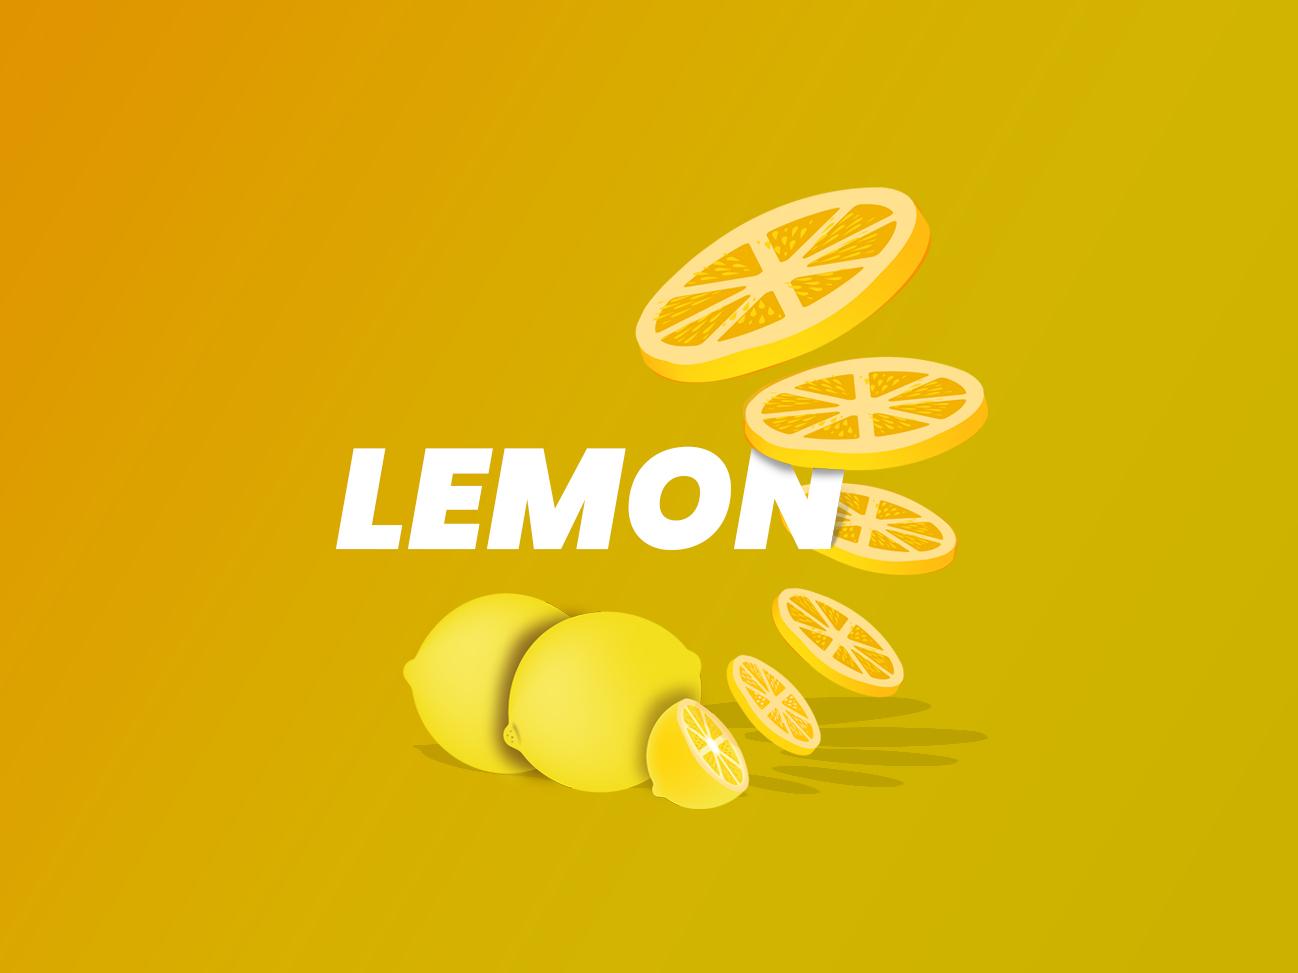 Lemon Design lemon design shots behance dribbble adobe icon illustration app typography cartoon procreate logo photoshop vector branding wacom illustraiton sketch designer